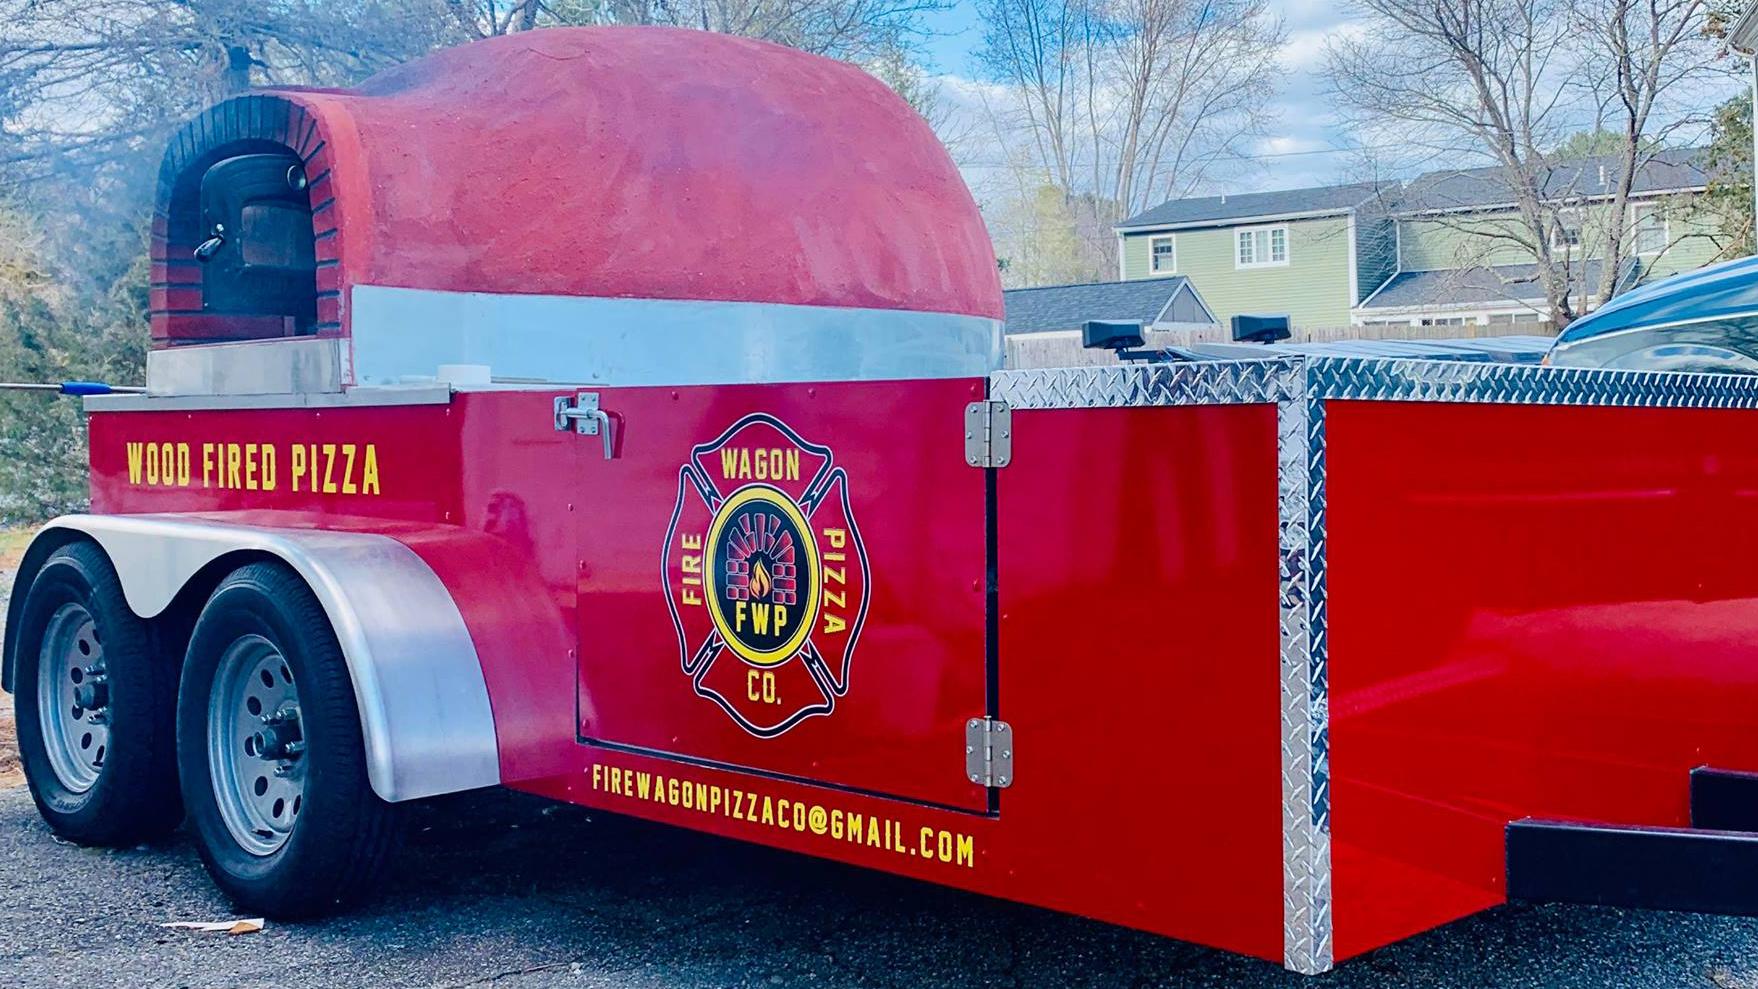 fire wagon pizza.jpg